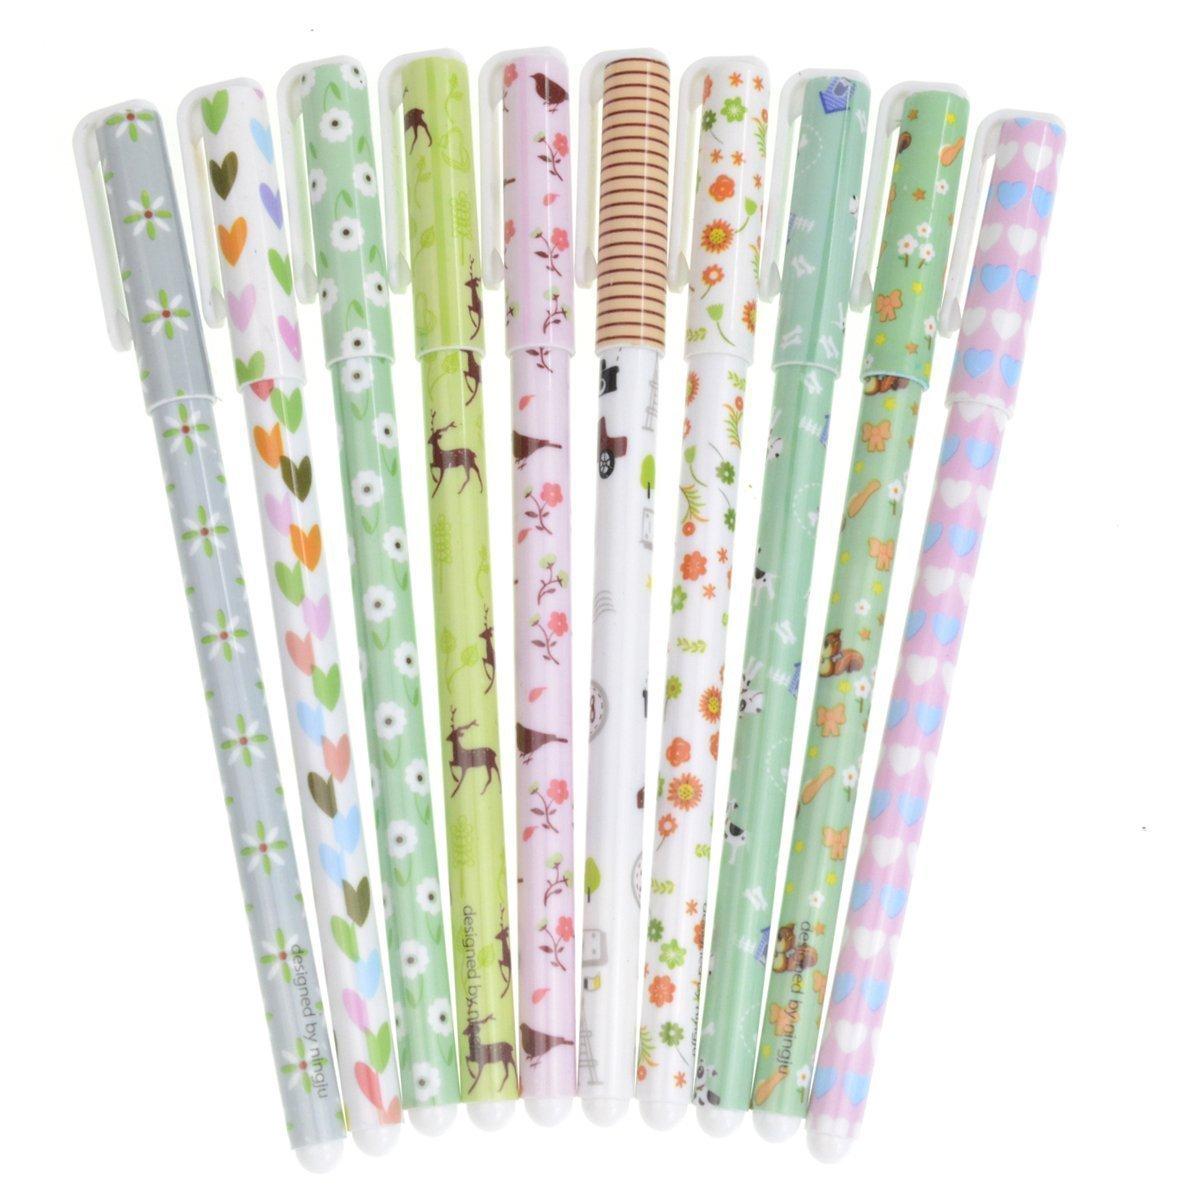 LEFV™ Premium Gel Ink Roller Ball Pens Fine Point Assorted Colors 10 Pack Set Cute Korean Cartoon Floral Pin Type Wholesale Kawaii Stationery for Office Student Girls Boys Teens Artist